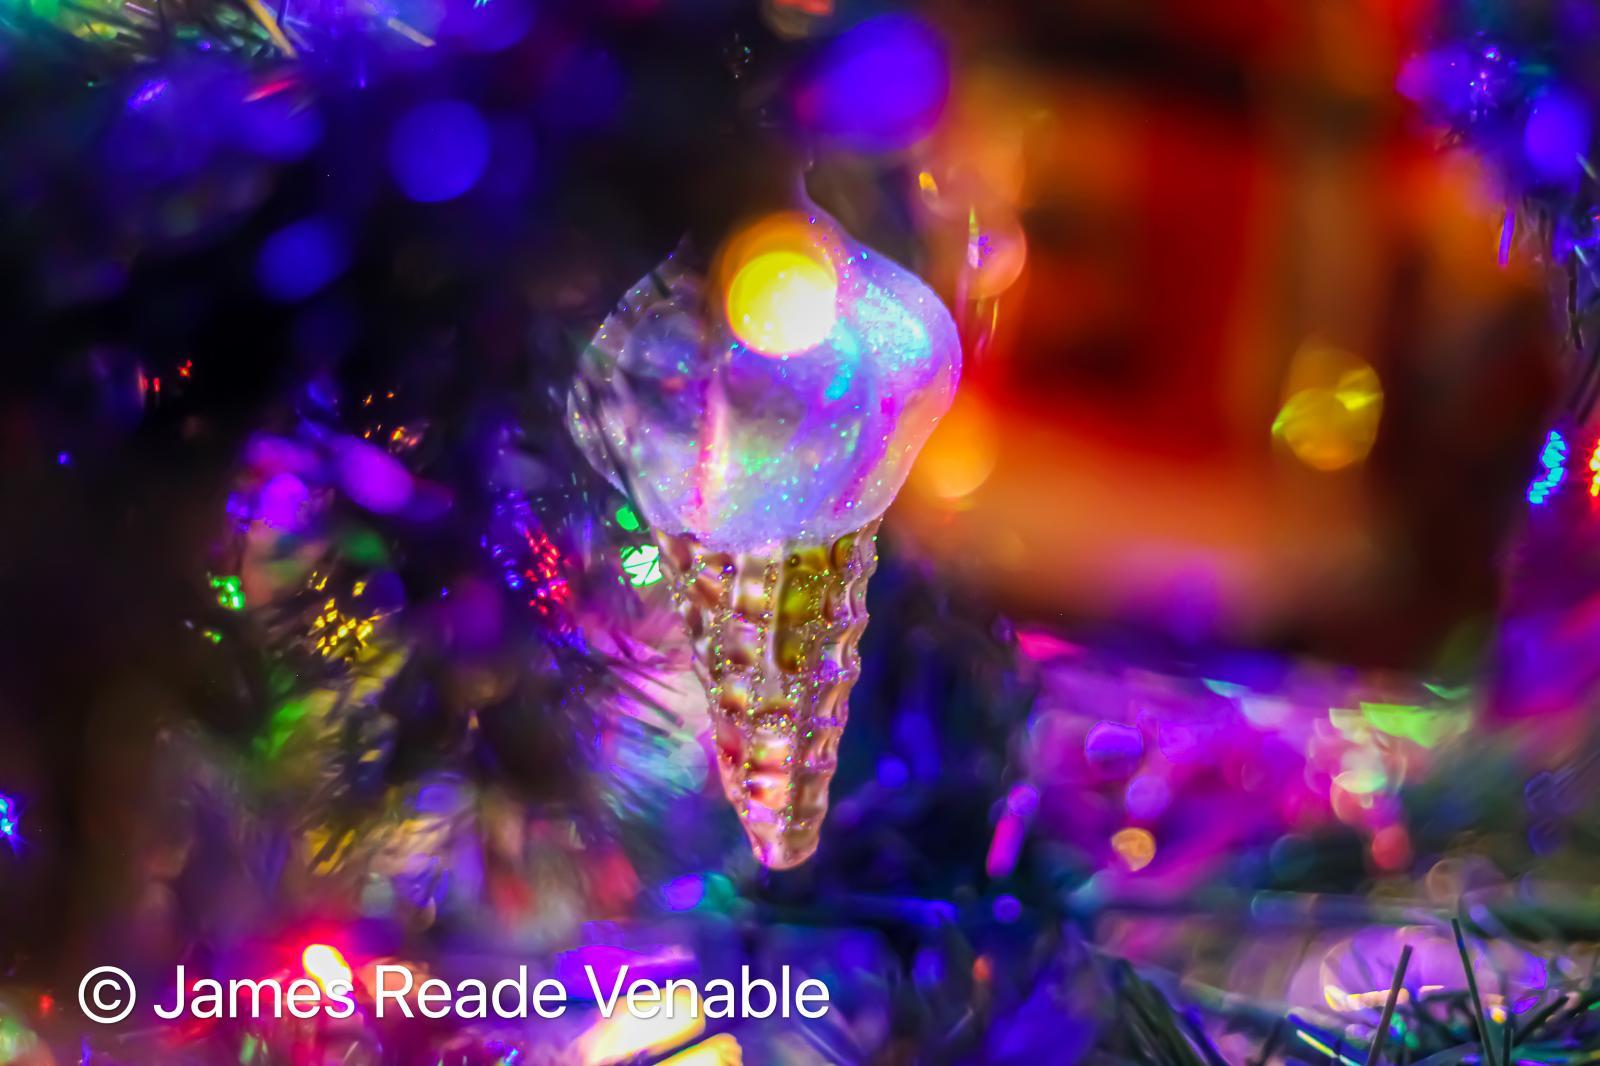 Photography image - Loading James_Reade_Venable__The_Magic_of_Christmas.jpg